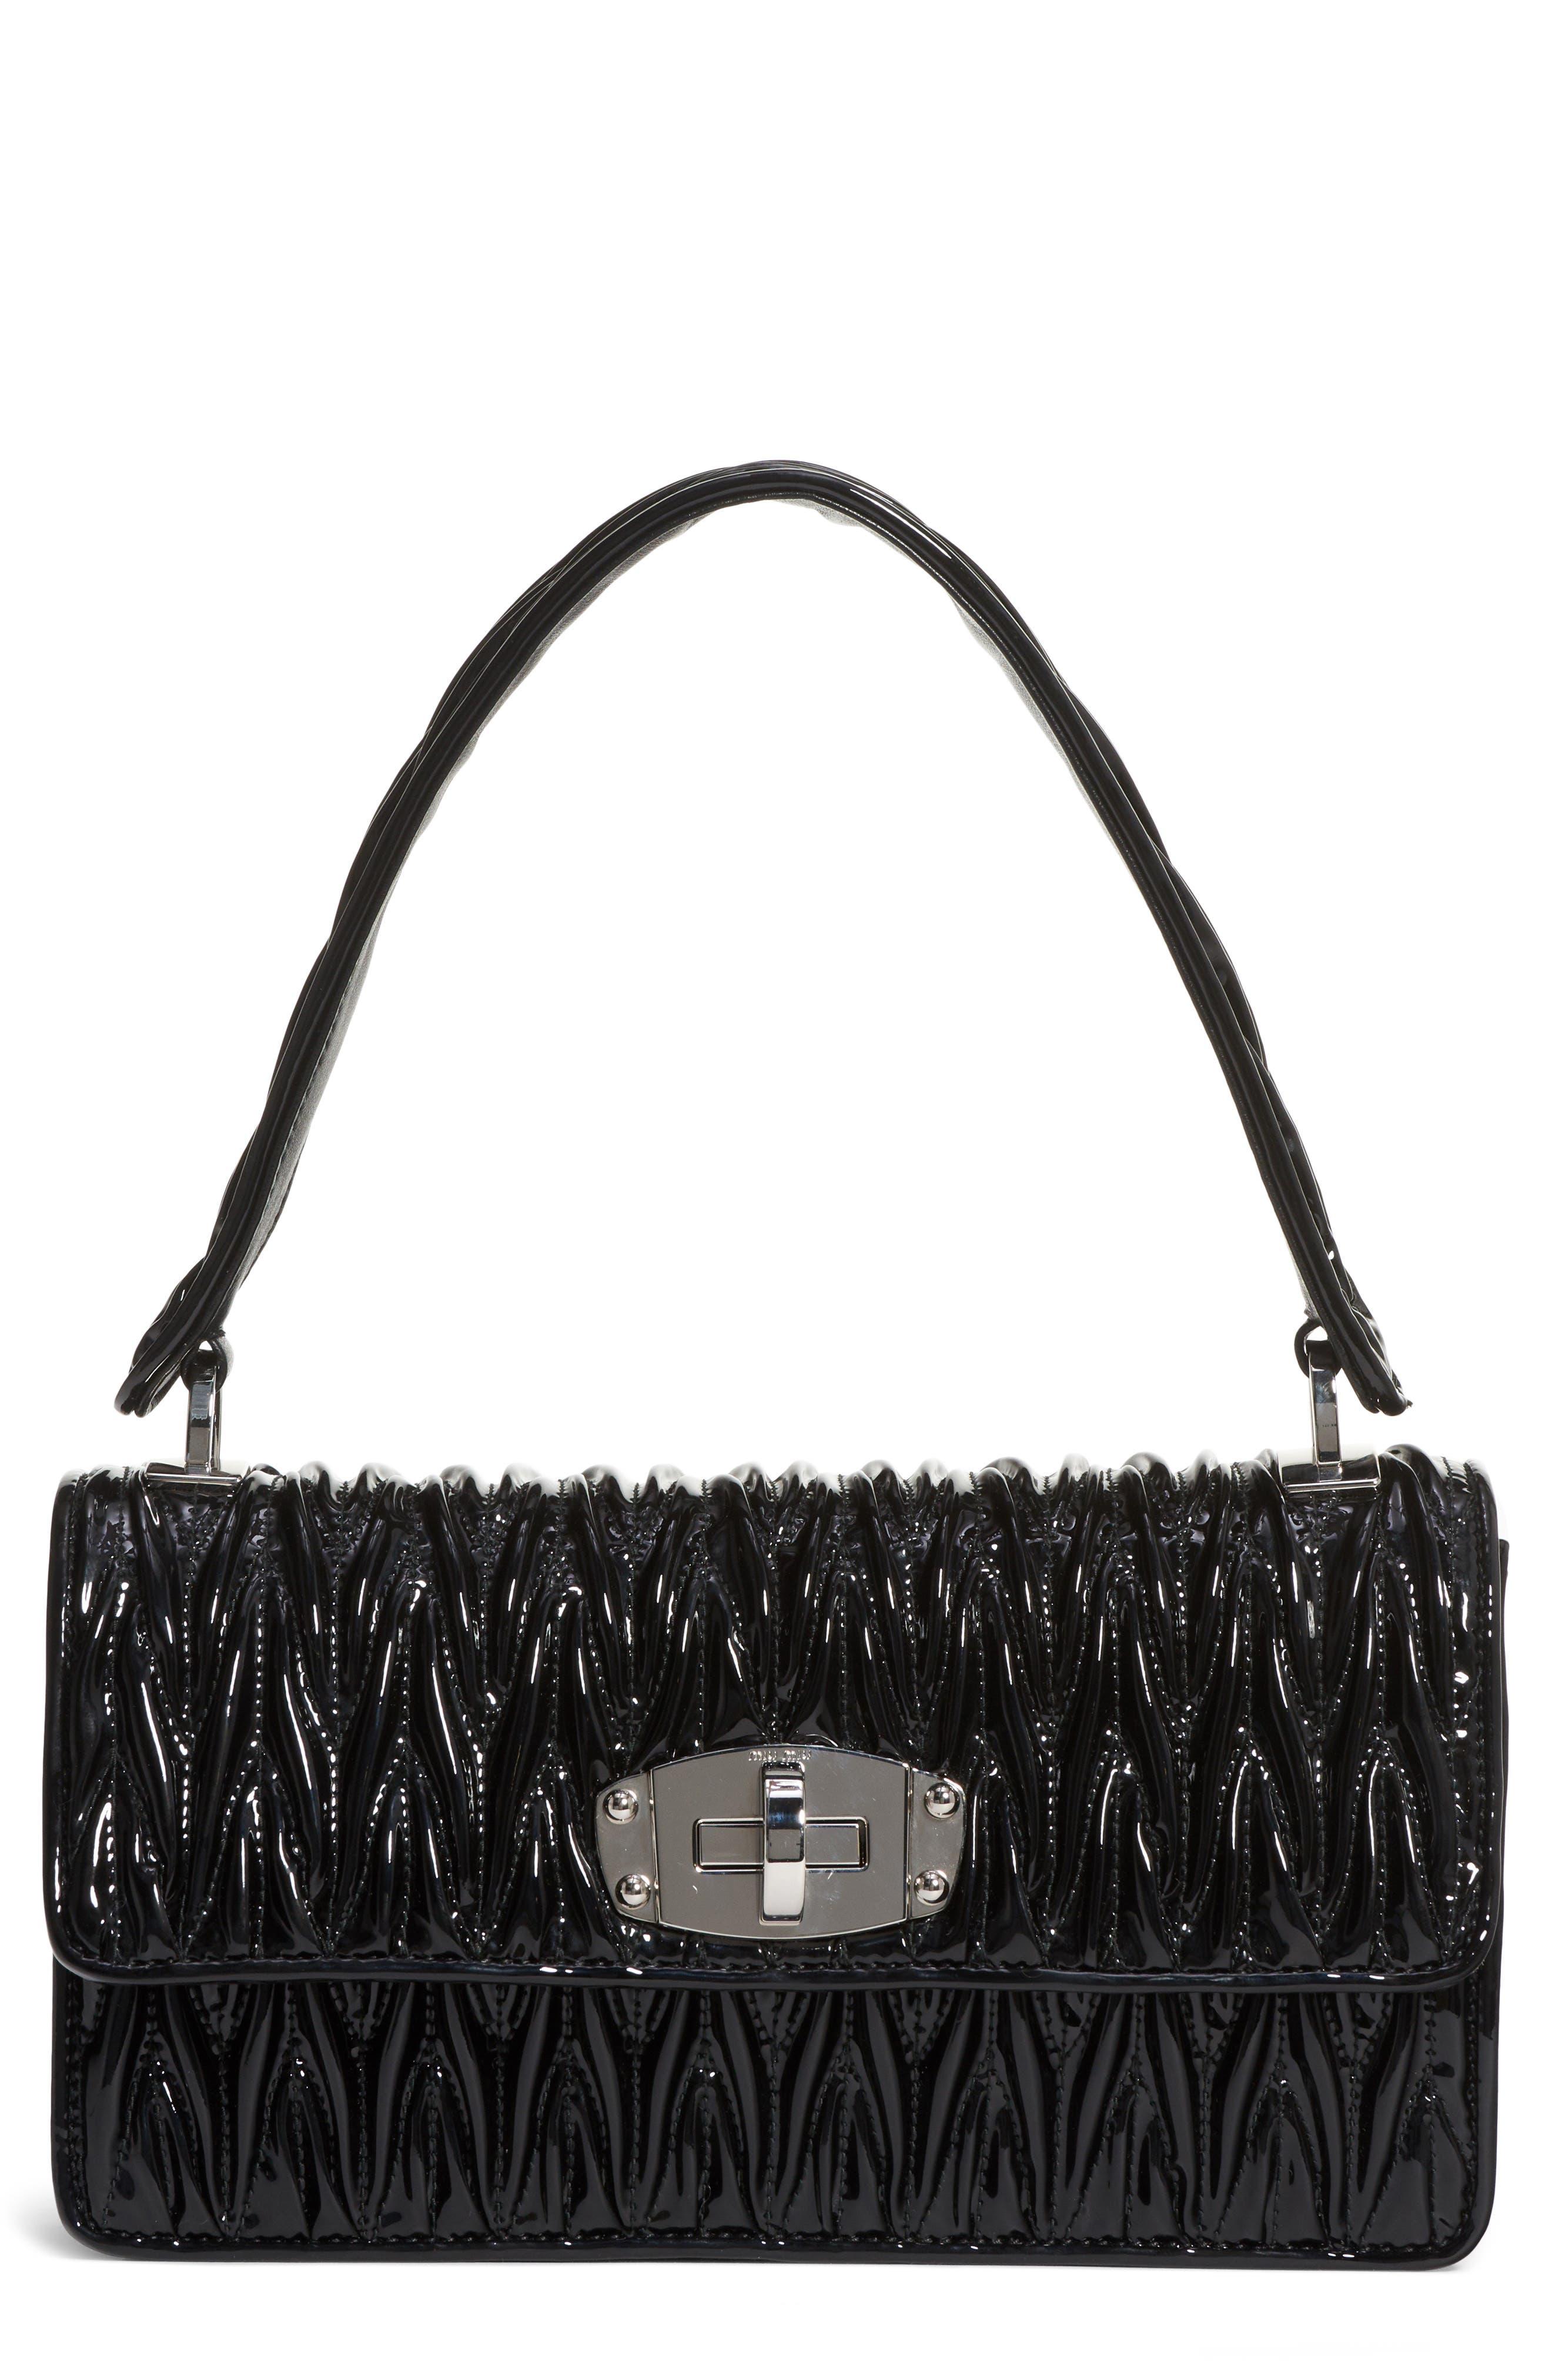 Vernice Matelassé Quilted Leather Shoulder Bag,                             Main thumbnail 1, color,                             NERO